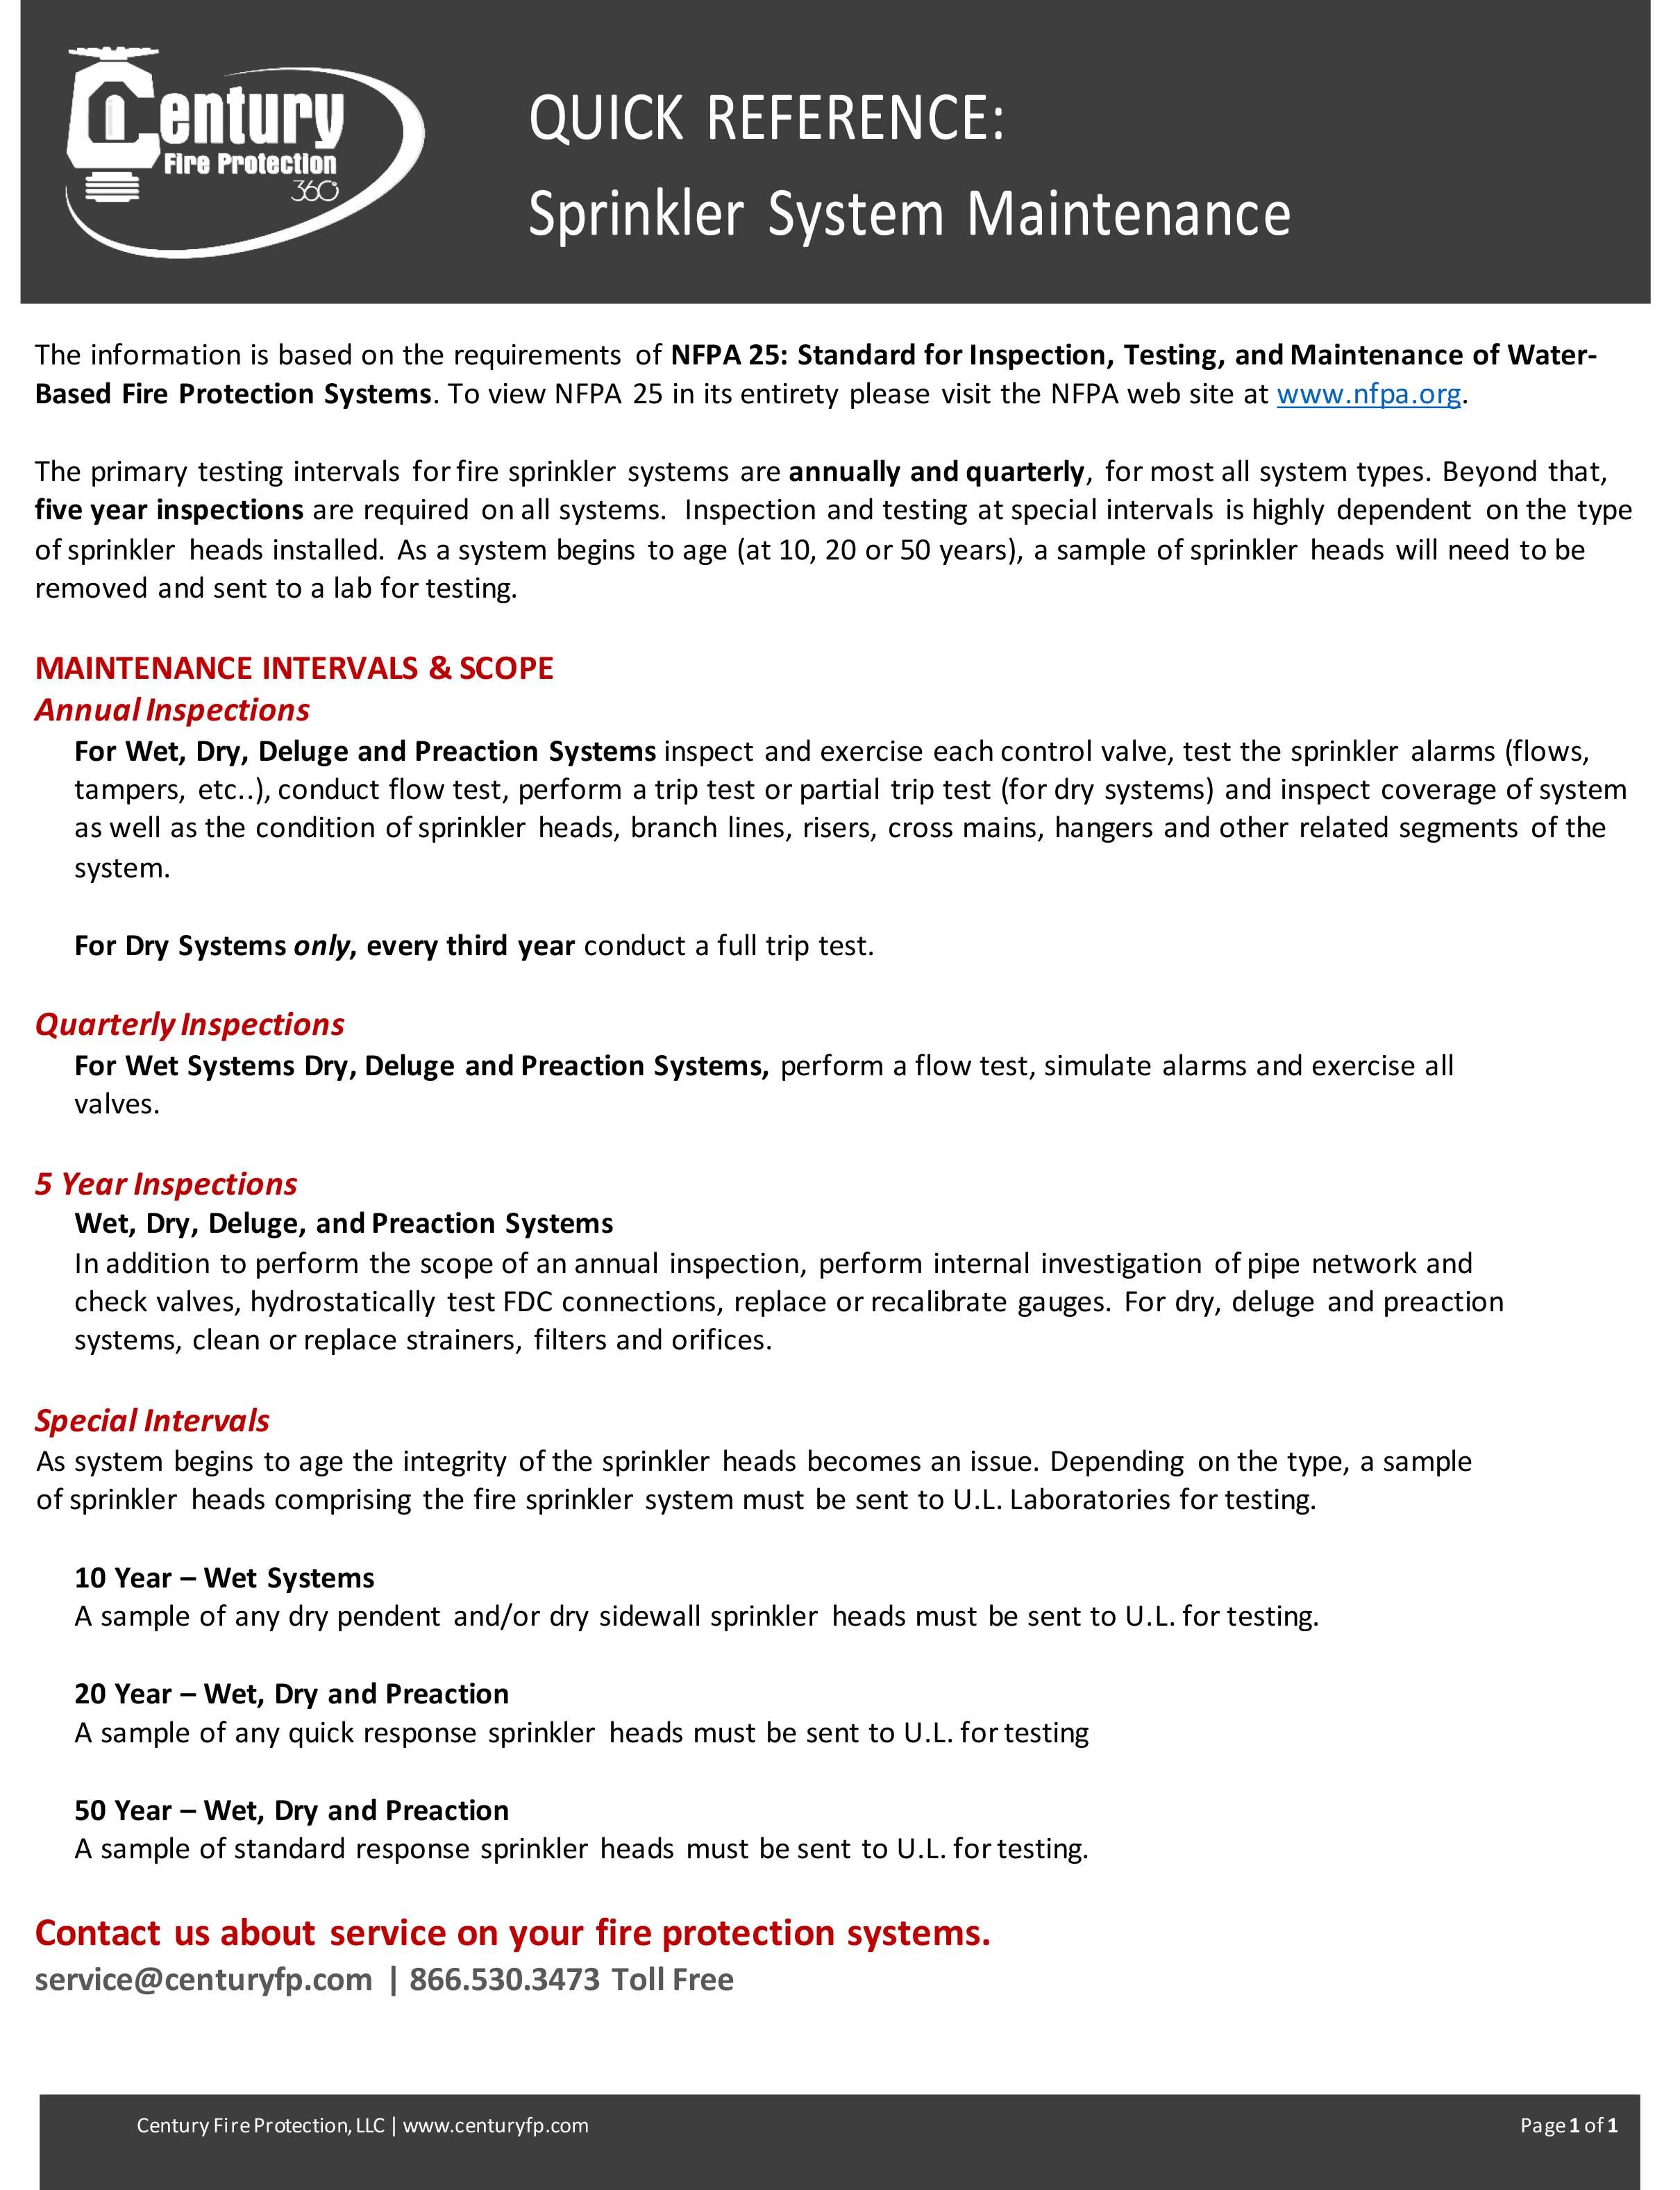 Content Offer - Quick Reference for Sprinkler System Maintenance Thumbnail.jpg